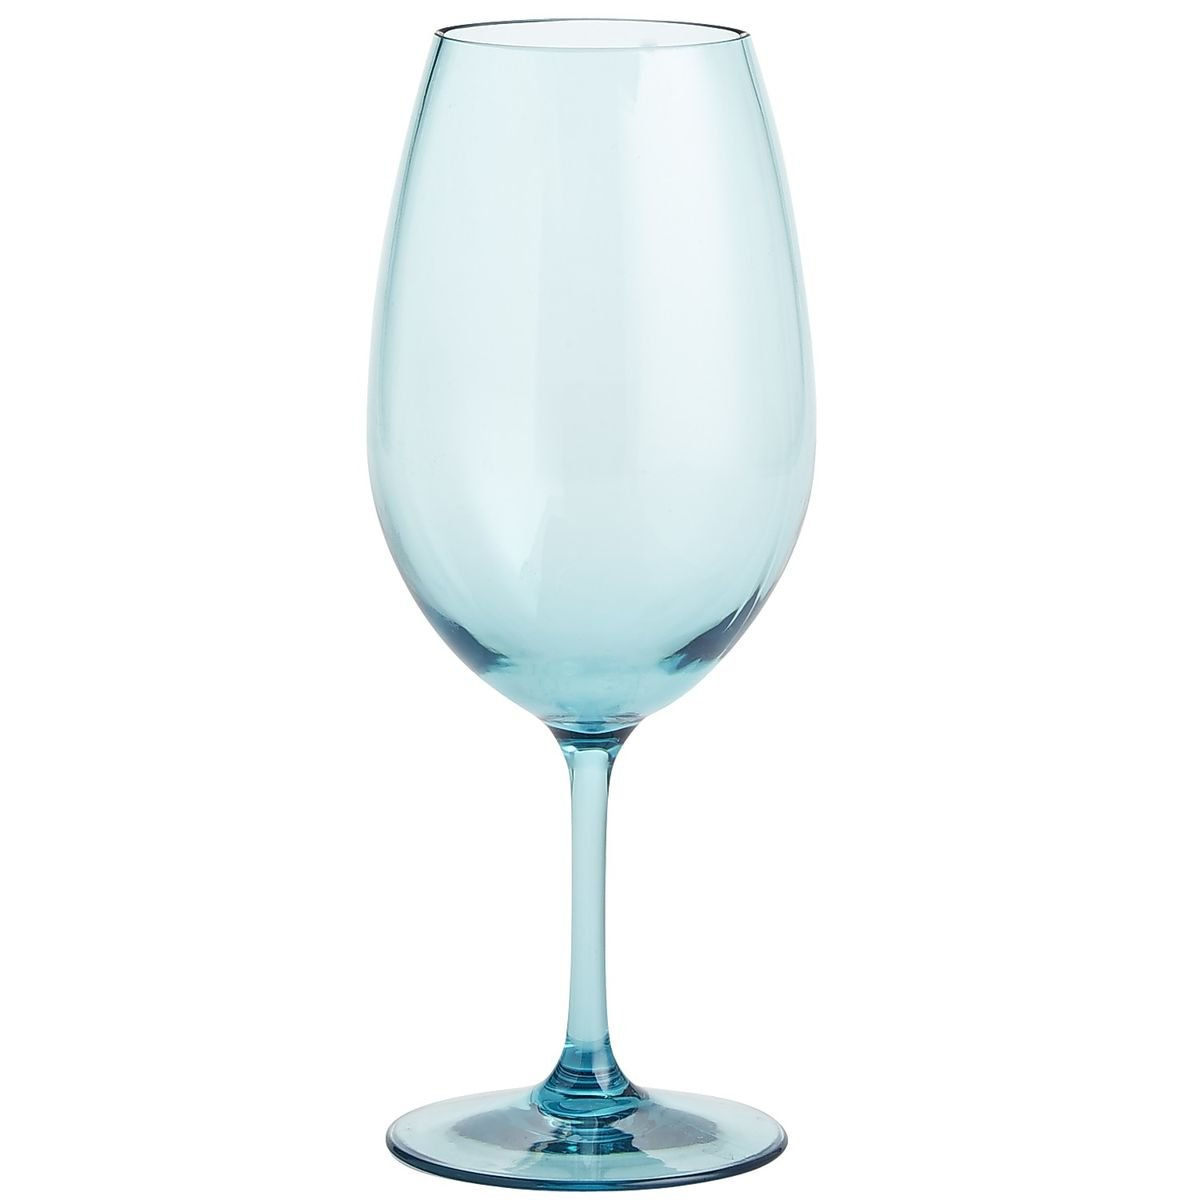 Clarity turquoise copa vino tinto sears com mx me for Copa vino tinto